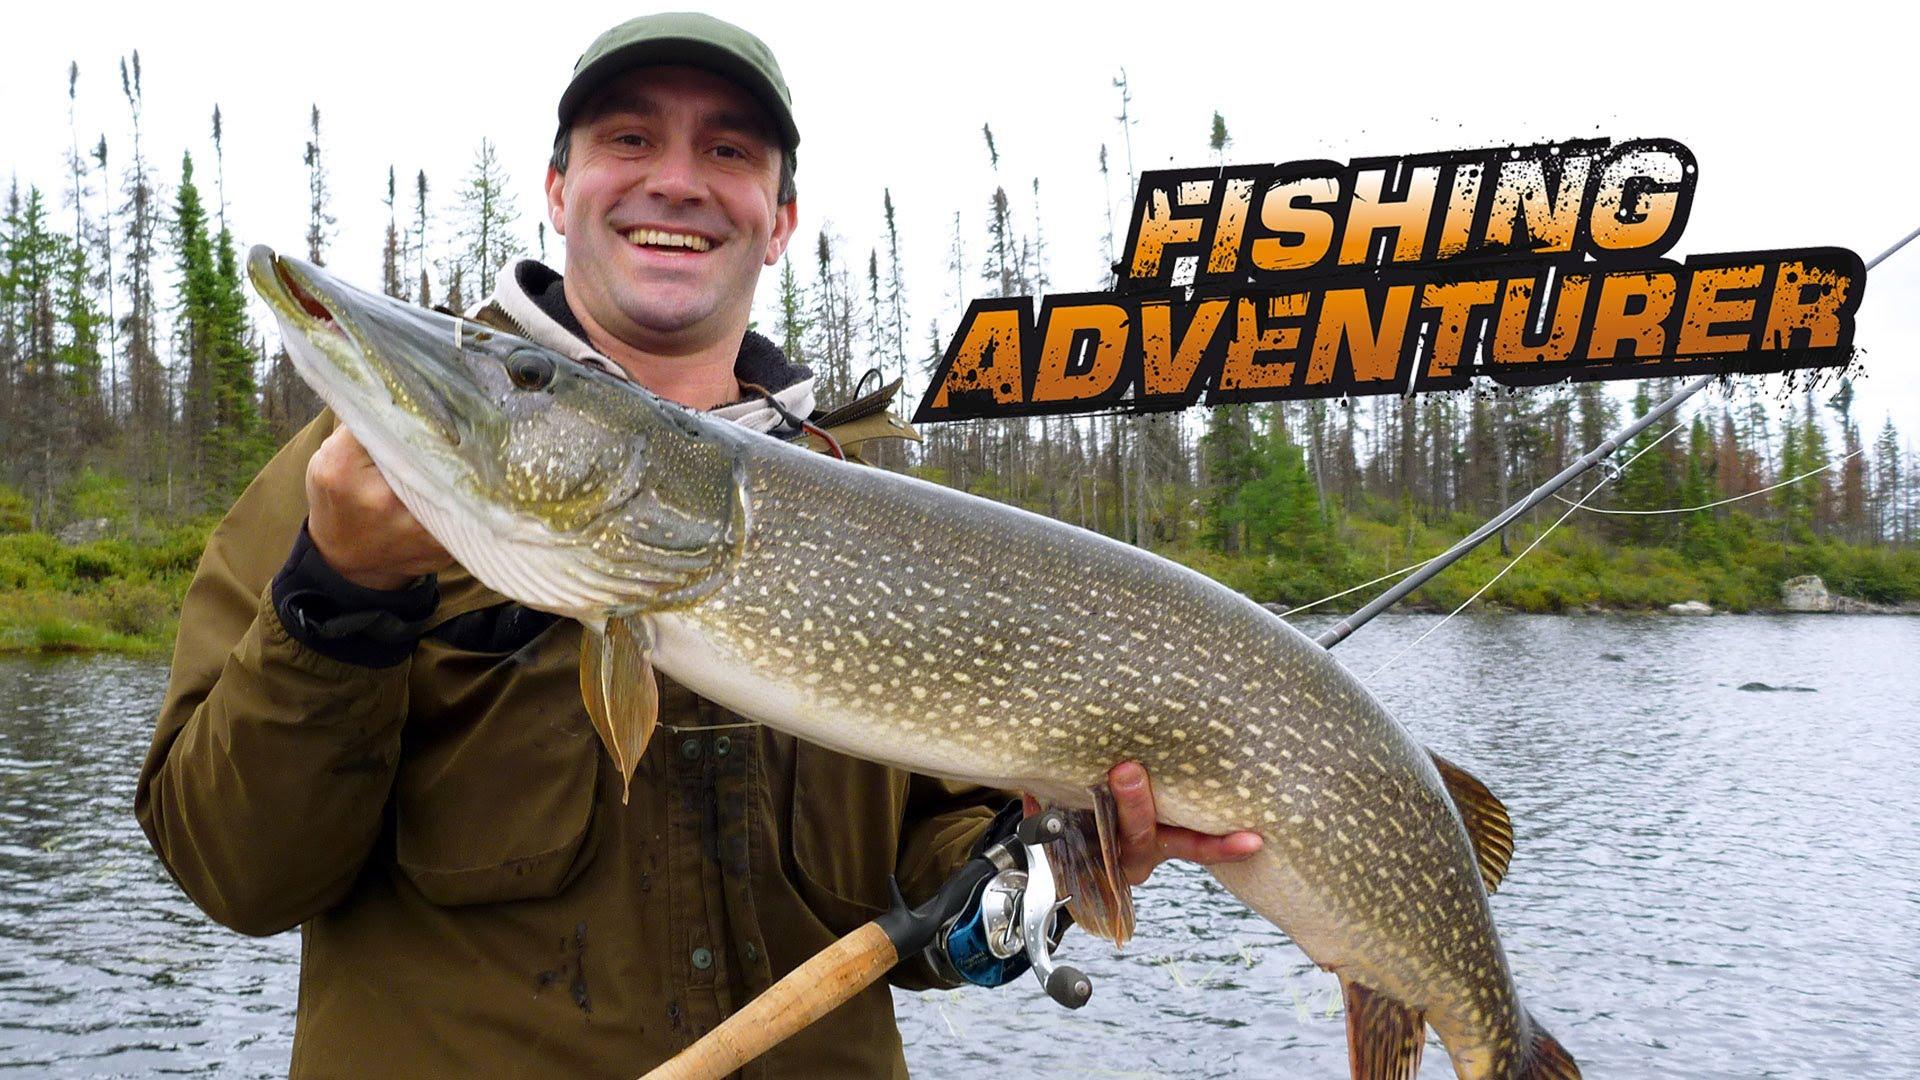 Jurassic pike in James Bay, Quebec — Fishing Adventurer